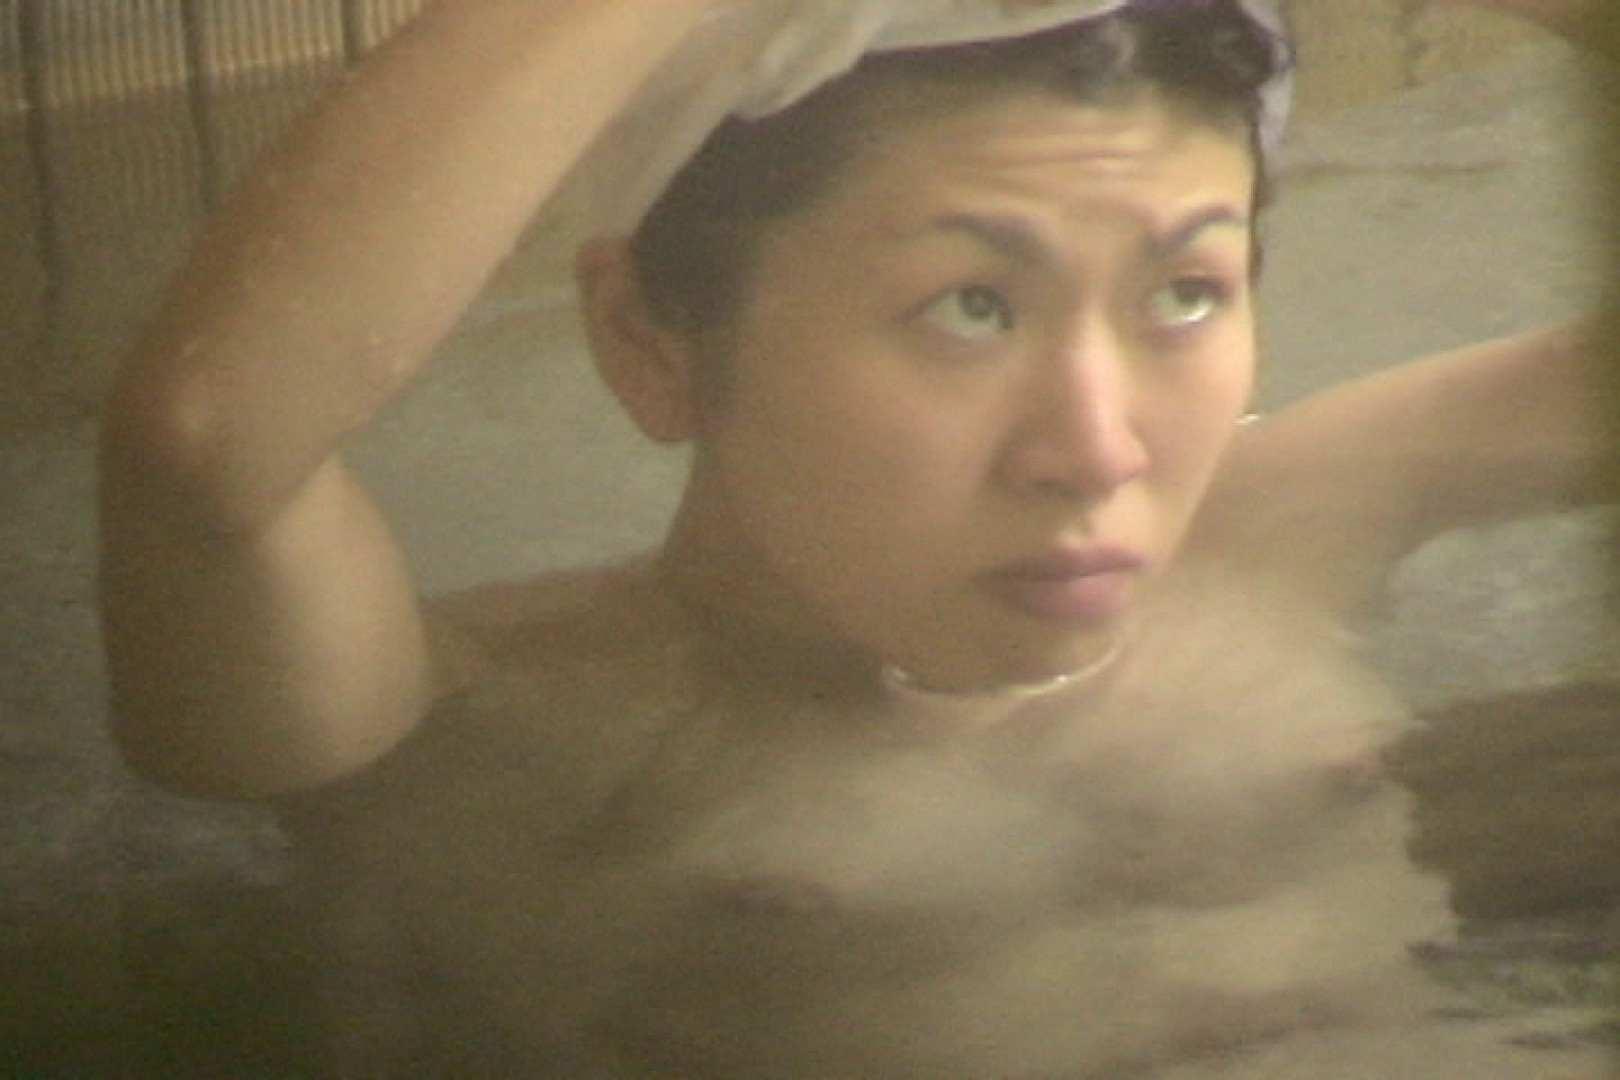 Aquaな露天風呂Vol.711 露天風呂突入 おまんこ無修正動画無料 97pic 23